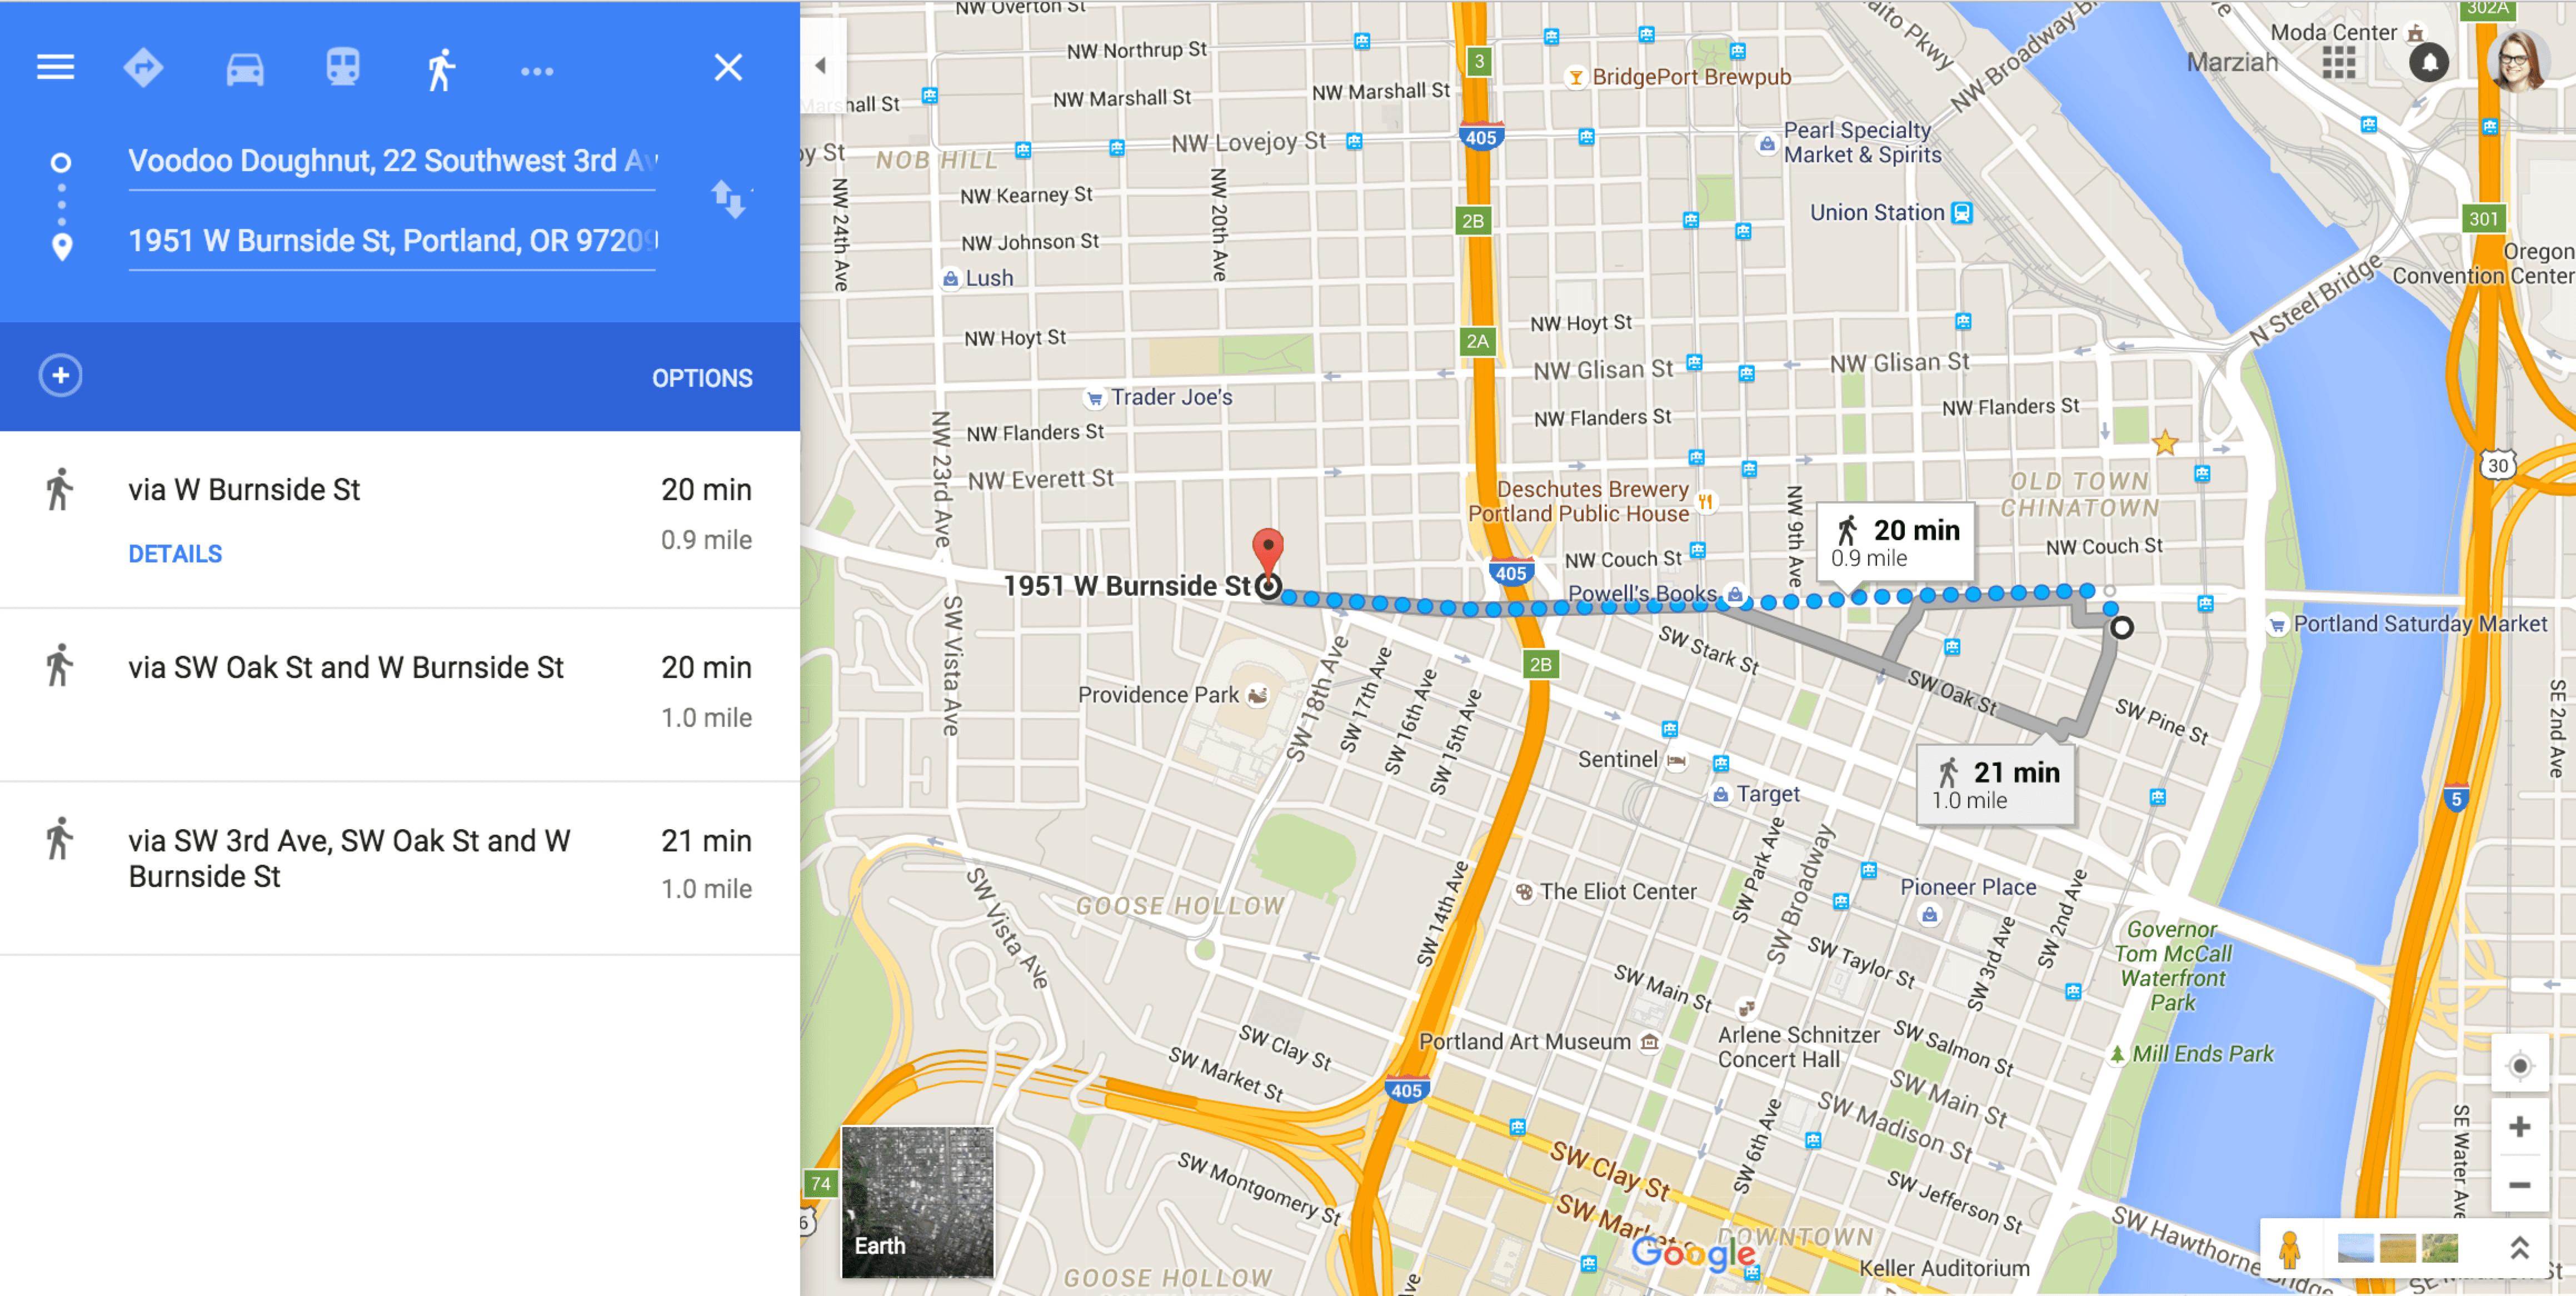 Google Maps San Diego California Printable Maps Google Maps Canada - Printable Directions Google Maps